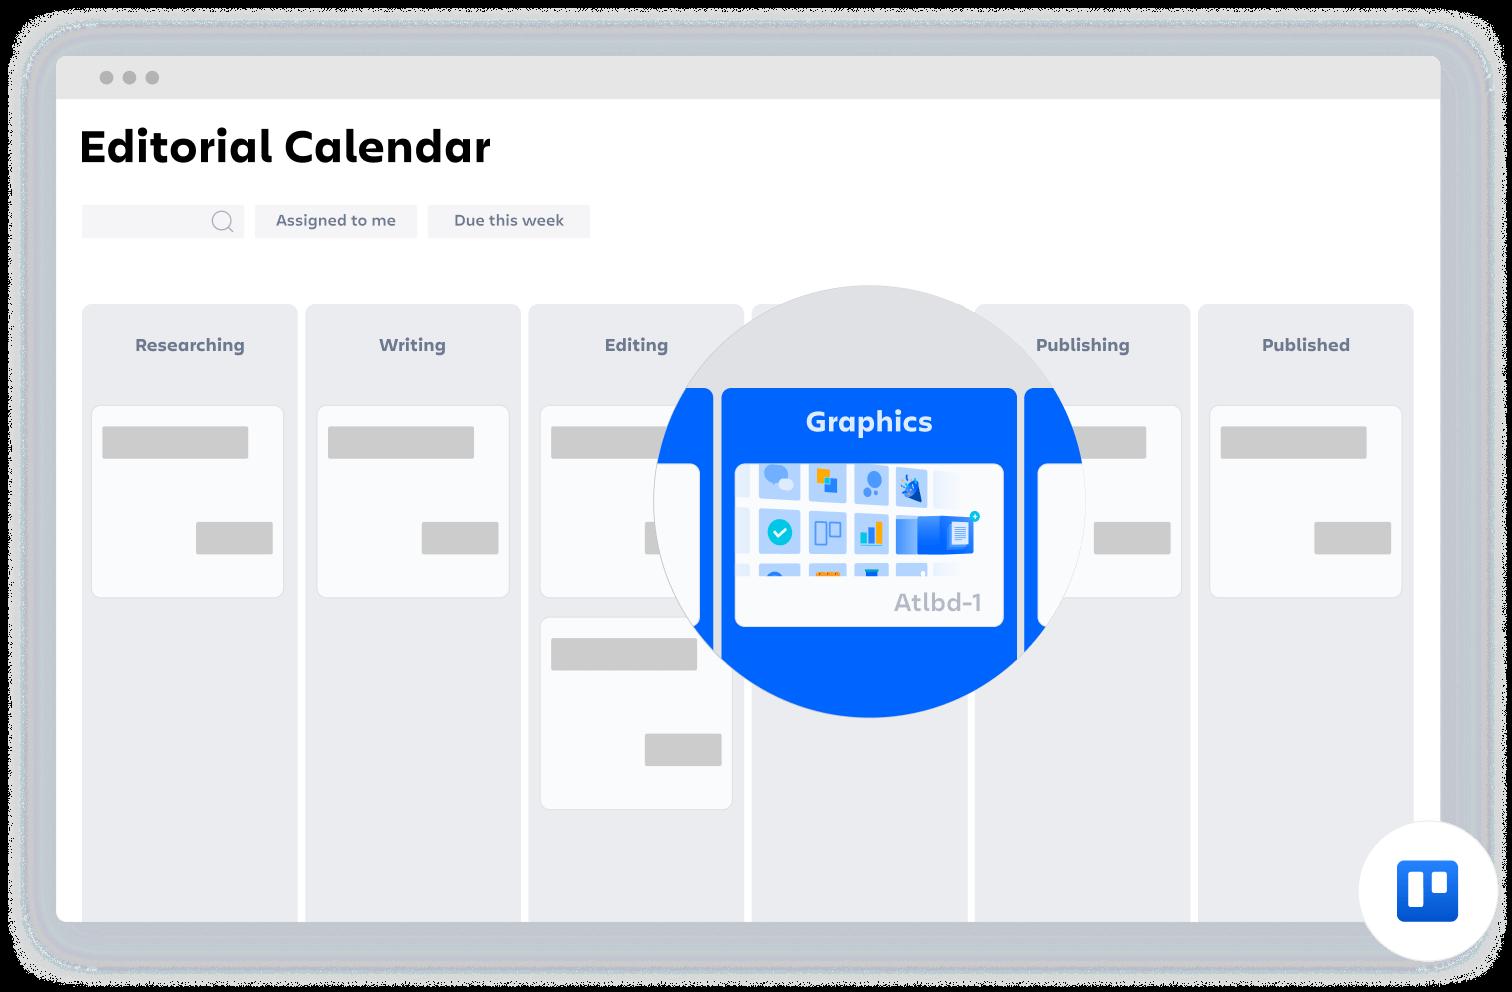 Confluence-sjabloon Redactionele kalender